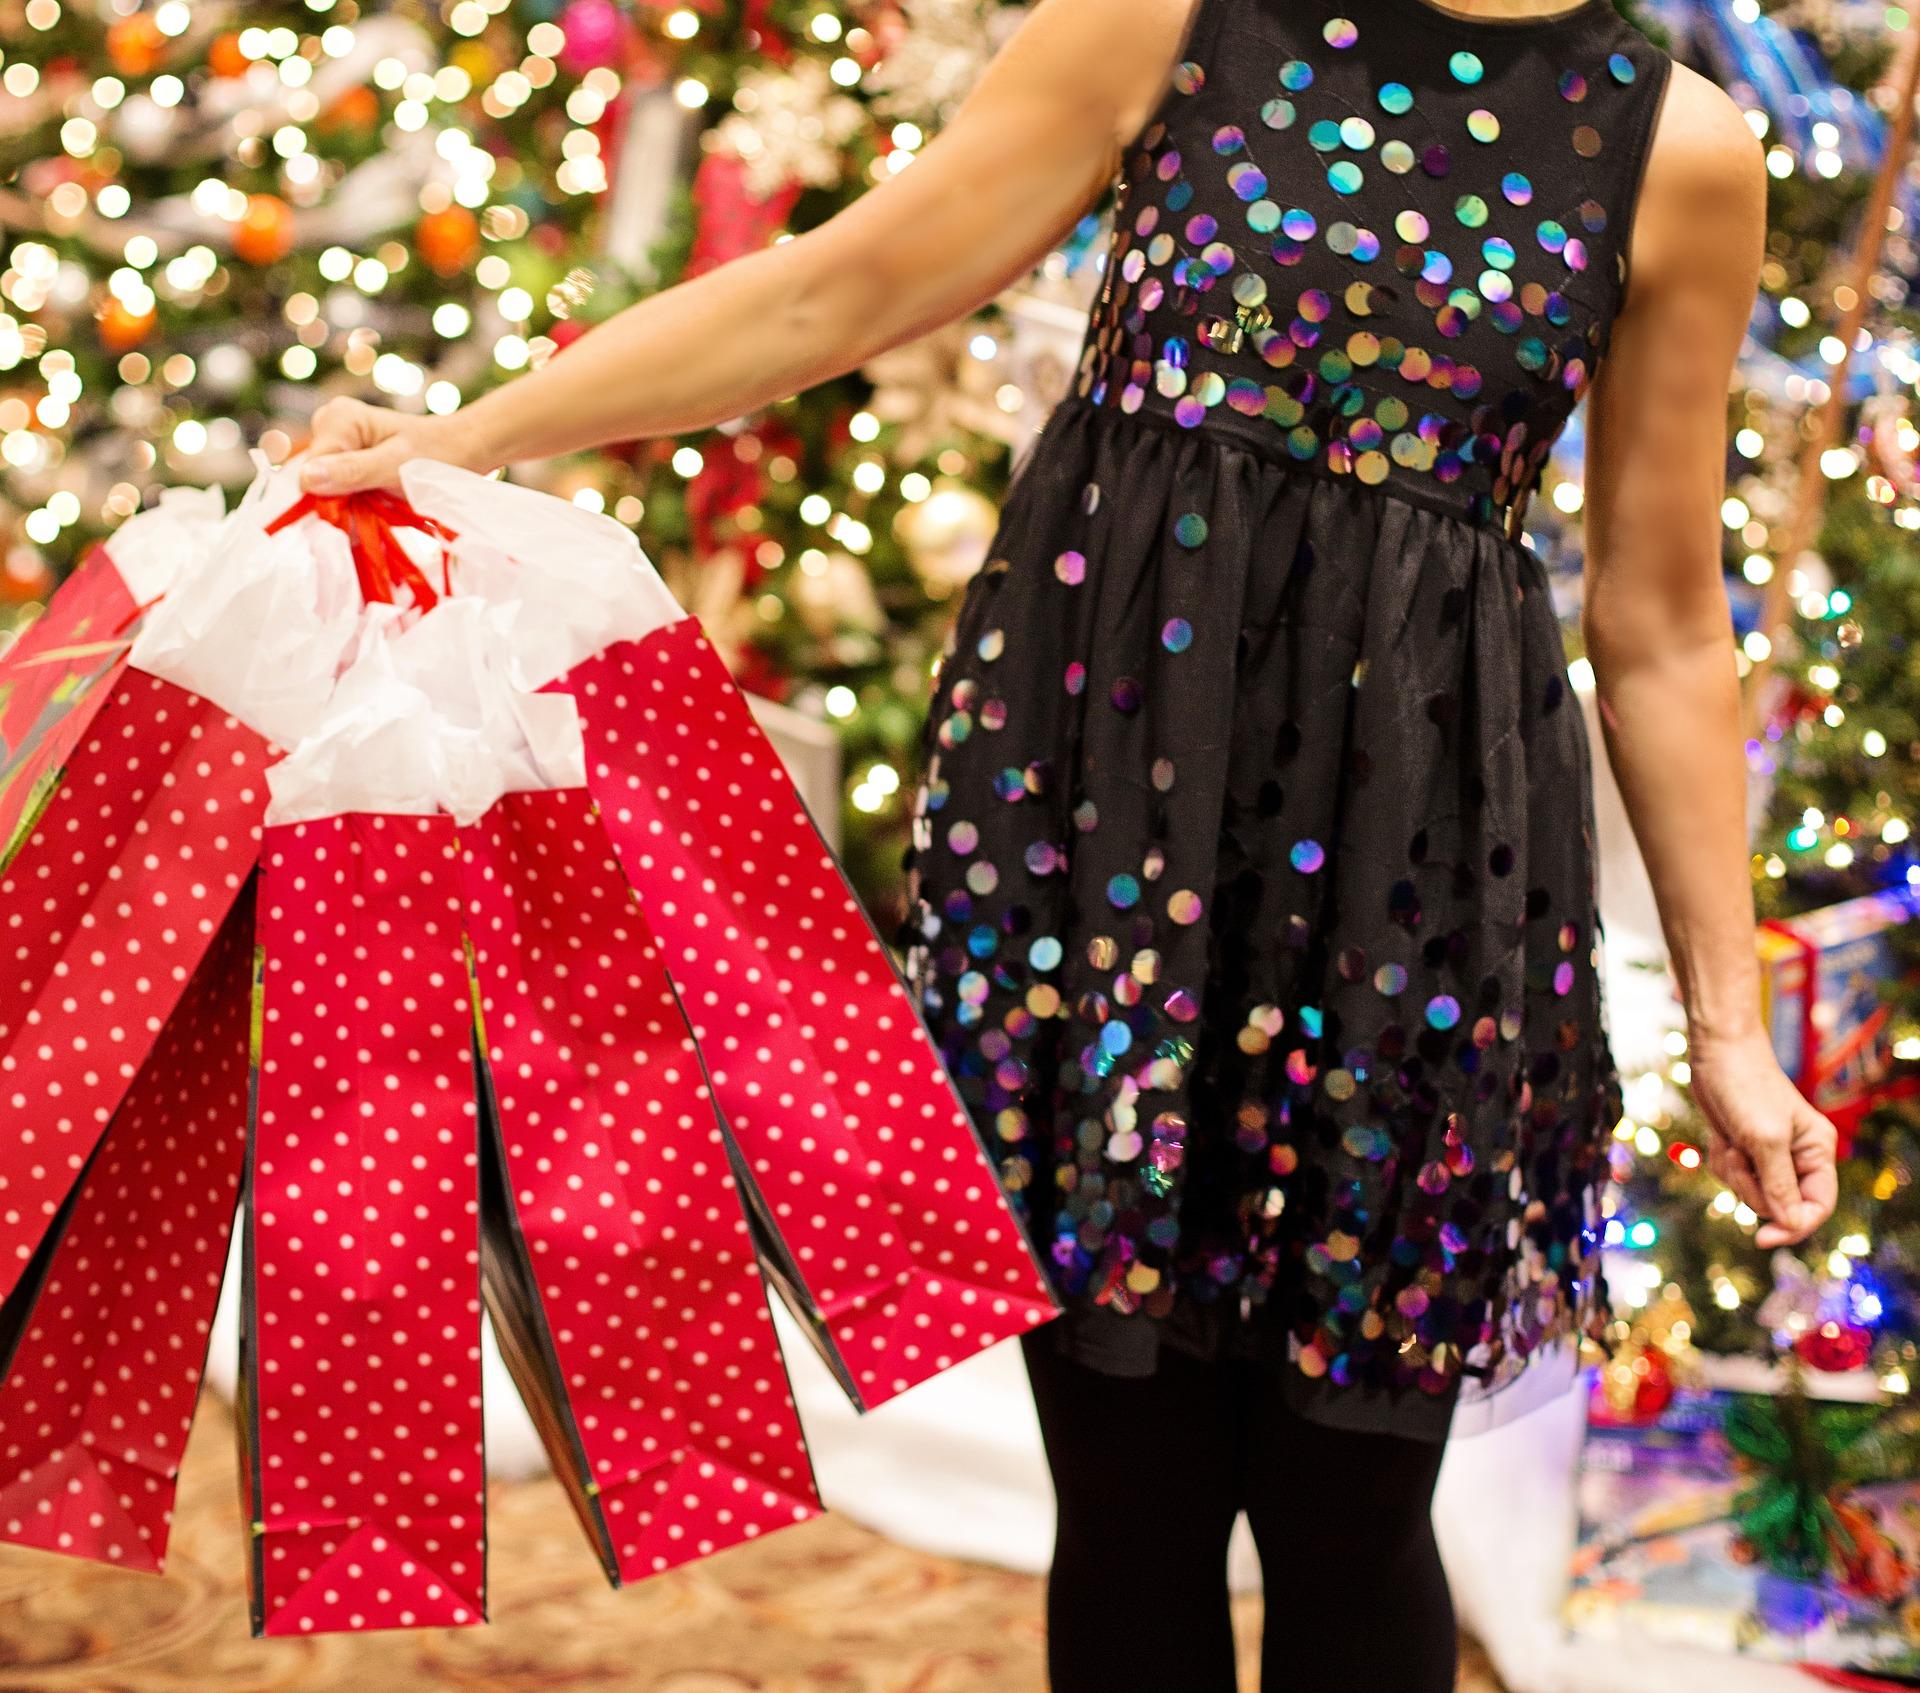 christmas-shopping-3823673_1920.jpg